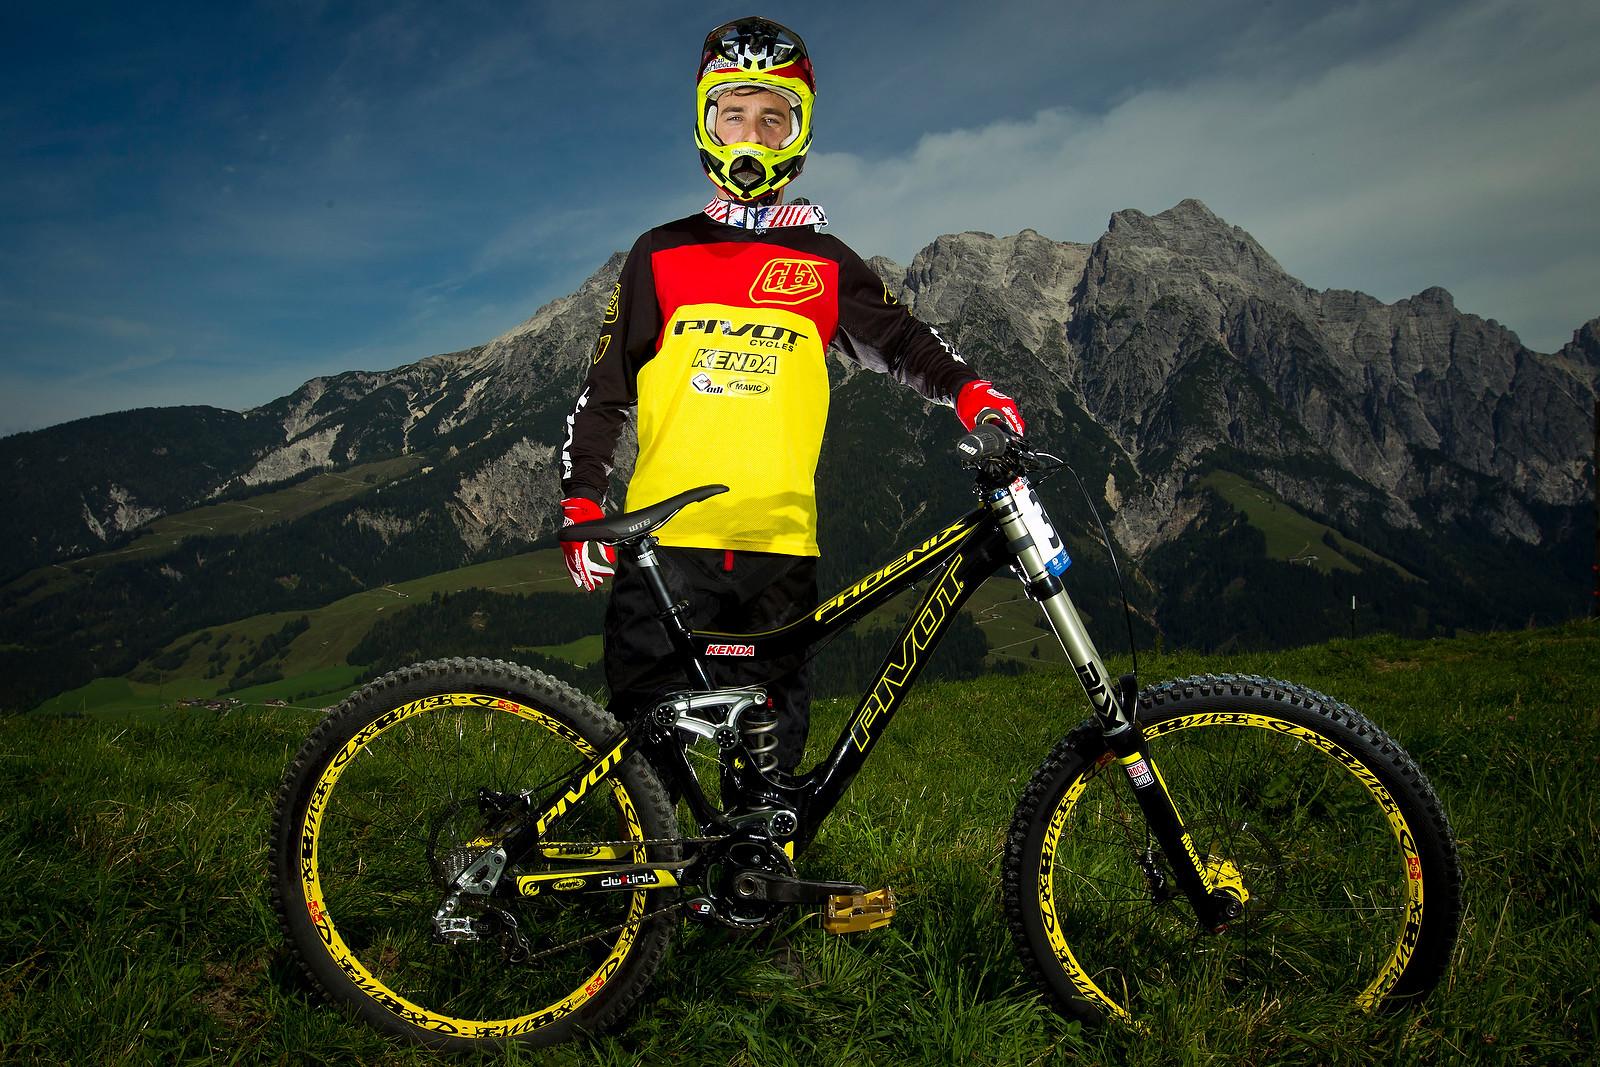 Luke Strobel with his Pivot Phoenix - World Championships Riders and Bikes - Mountain Biking Pictures - Vital MTB